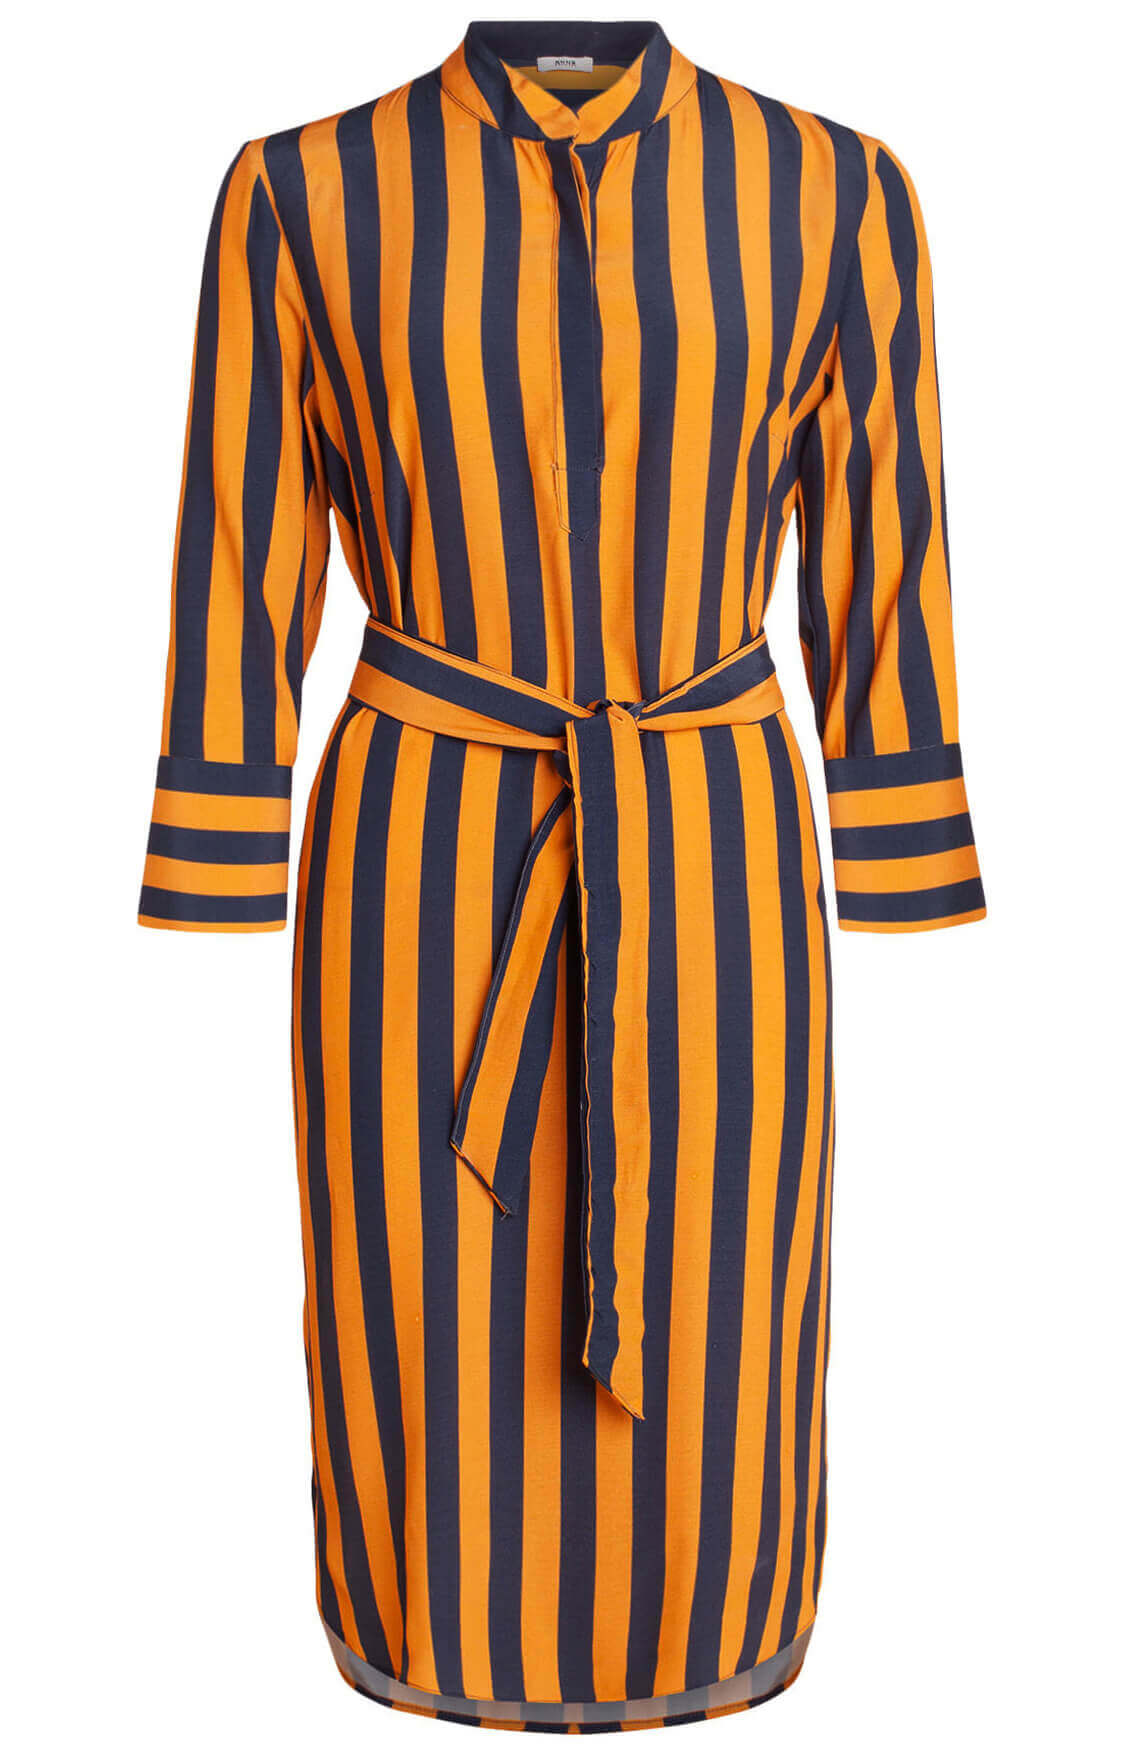 Anna Dames Gestreepte jurk Oranje